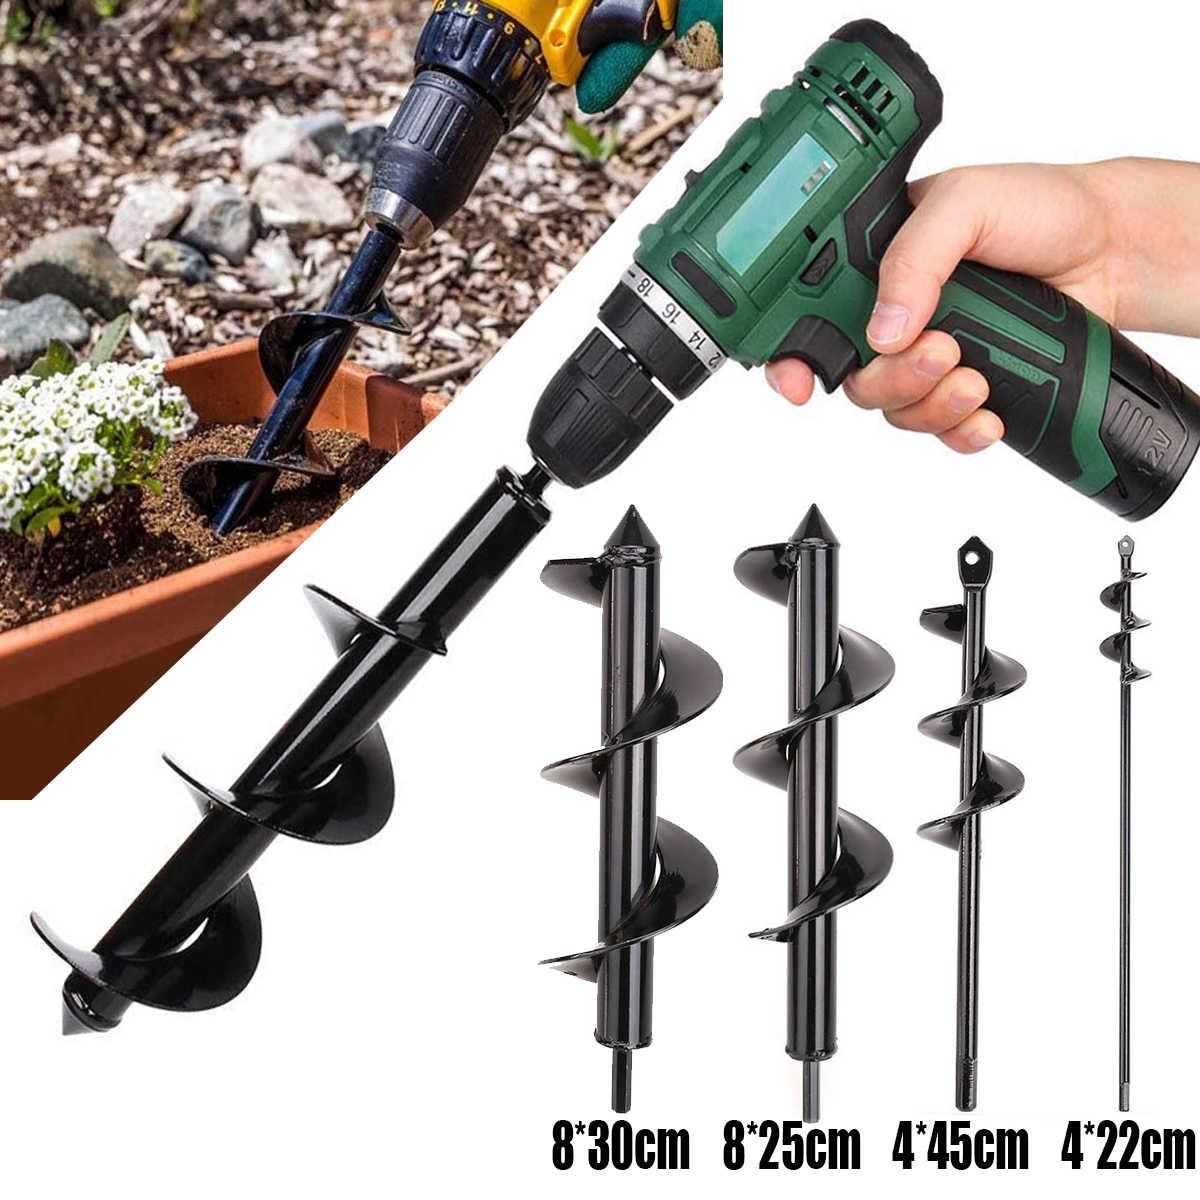 Garden Auger Spiral Drill Bit for Planting Digger Tool